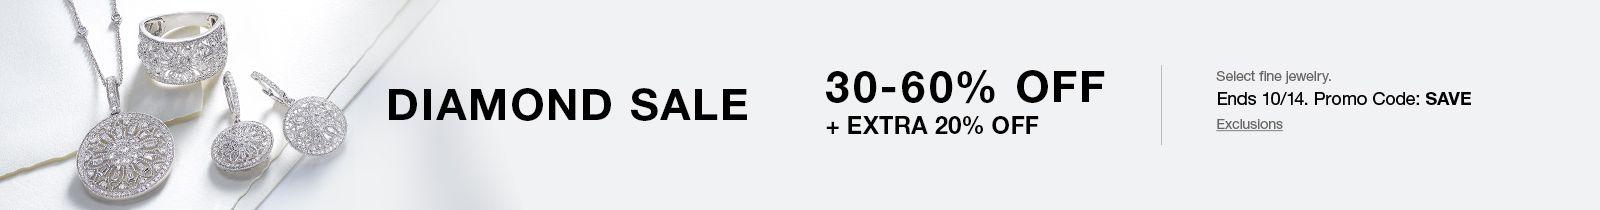 Diamond Sale, 30-60 percent off plus Extra 20 percent off